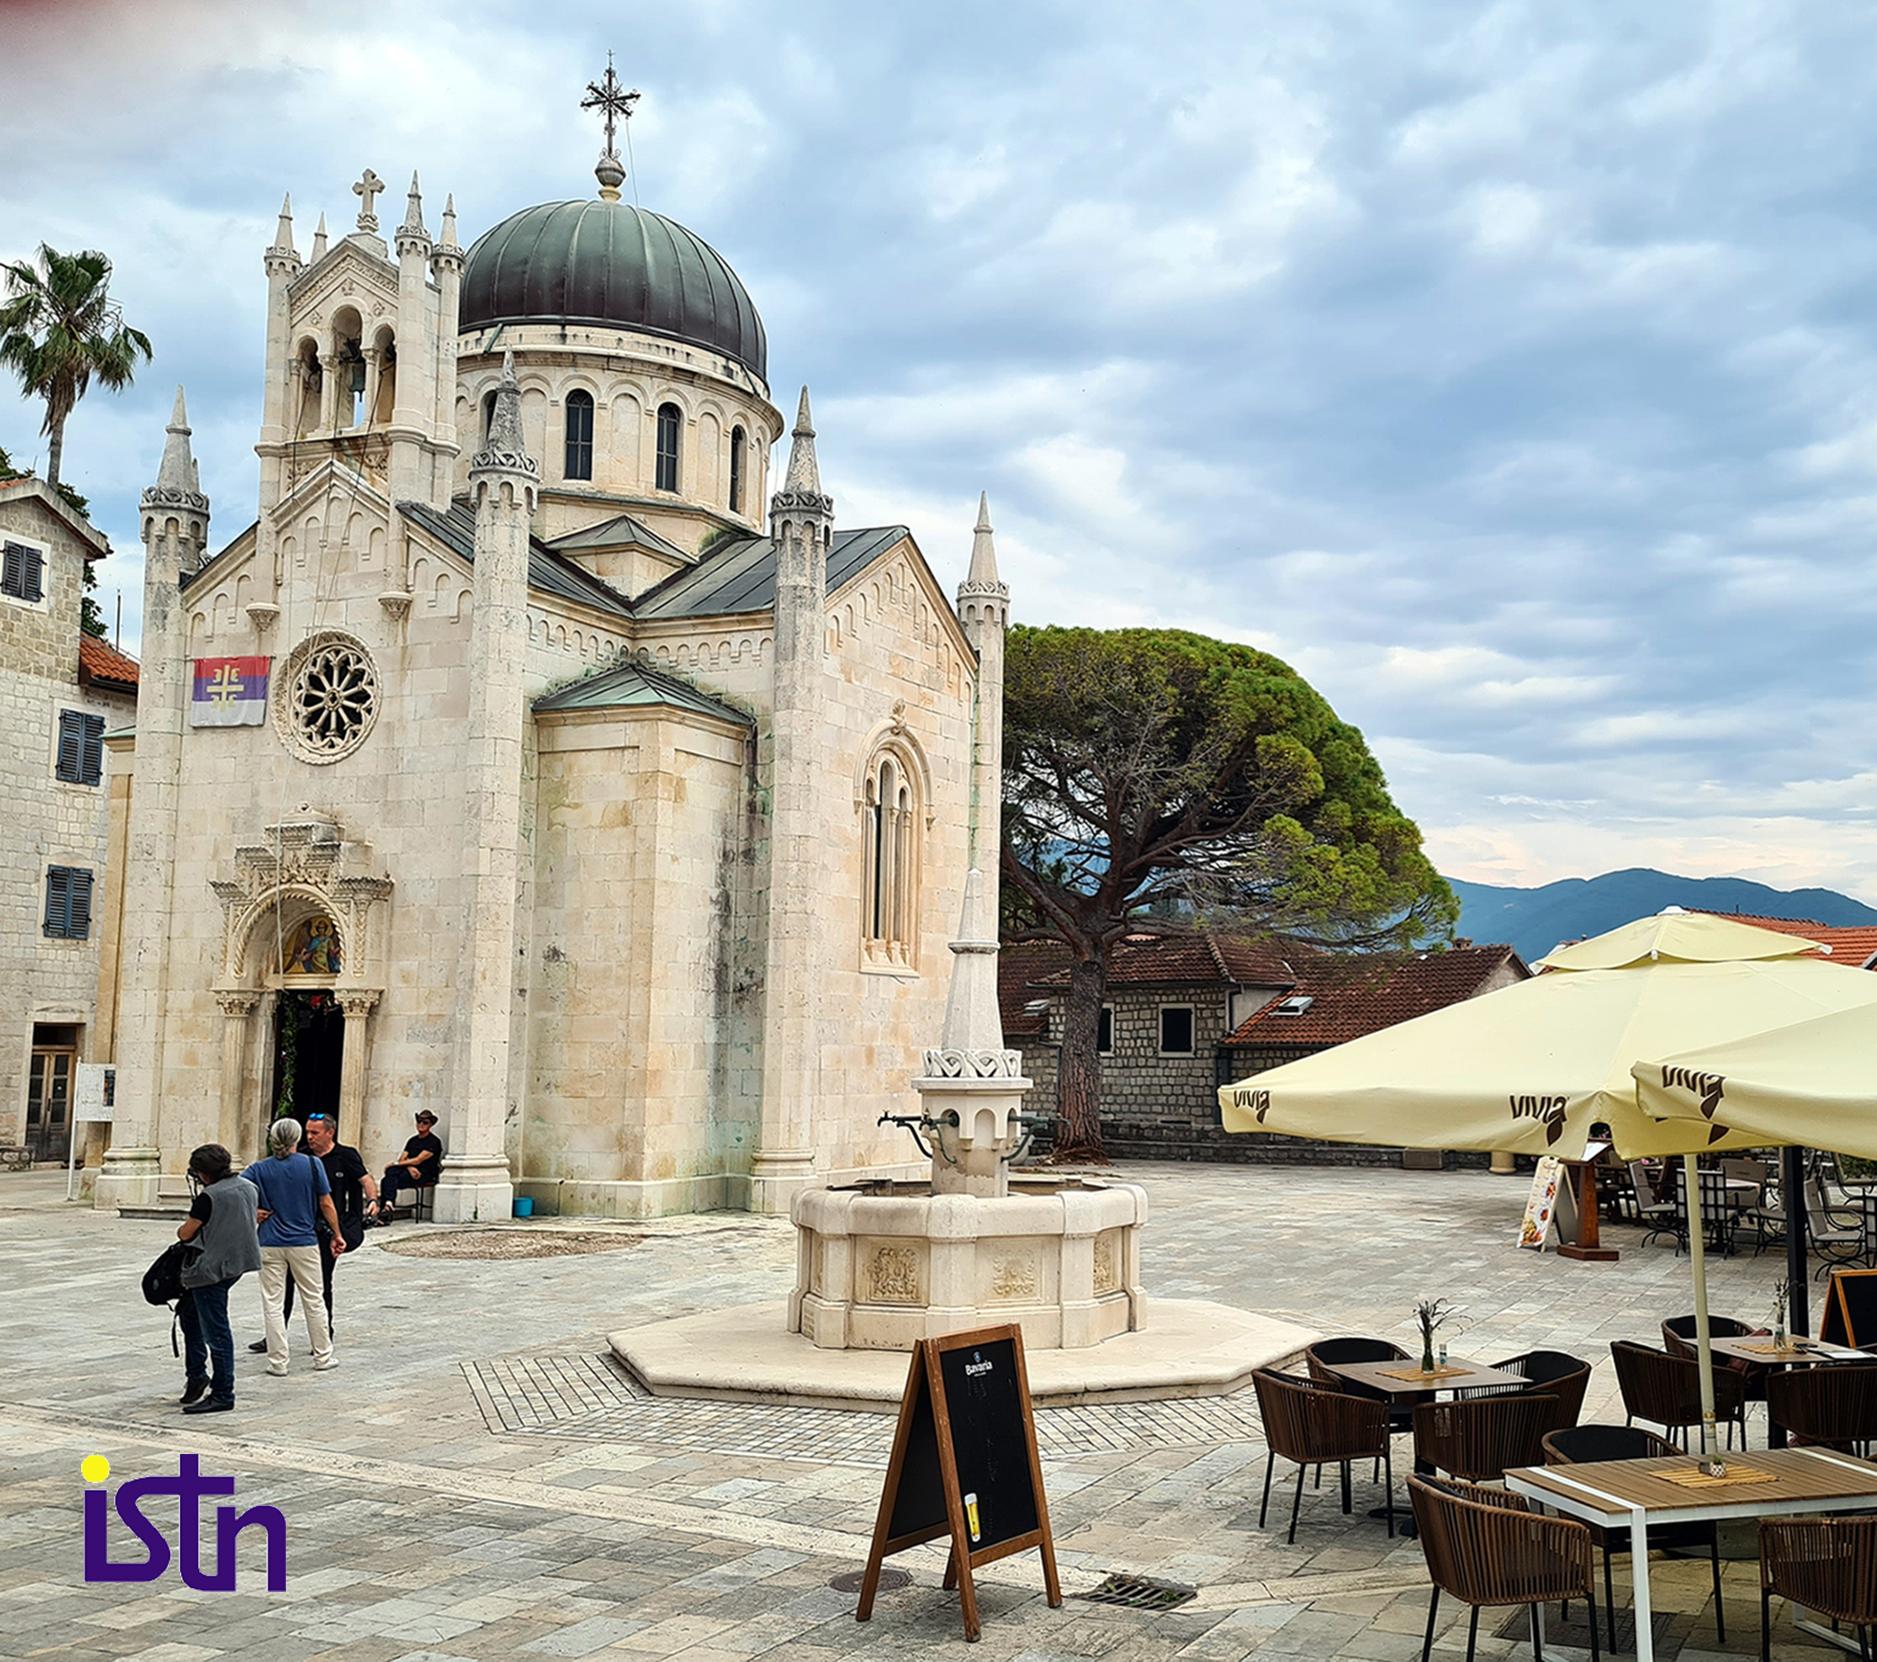 Crkva Svetog Arhangela Mihaila, Herceg Novi, ISTN